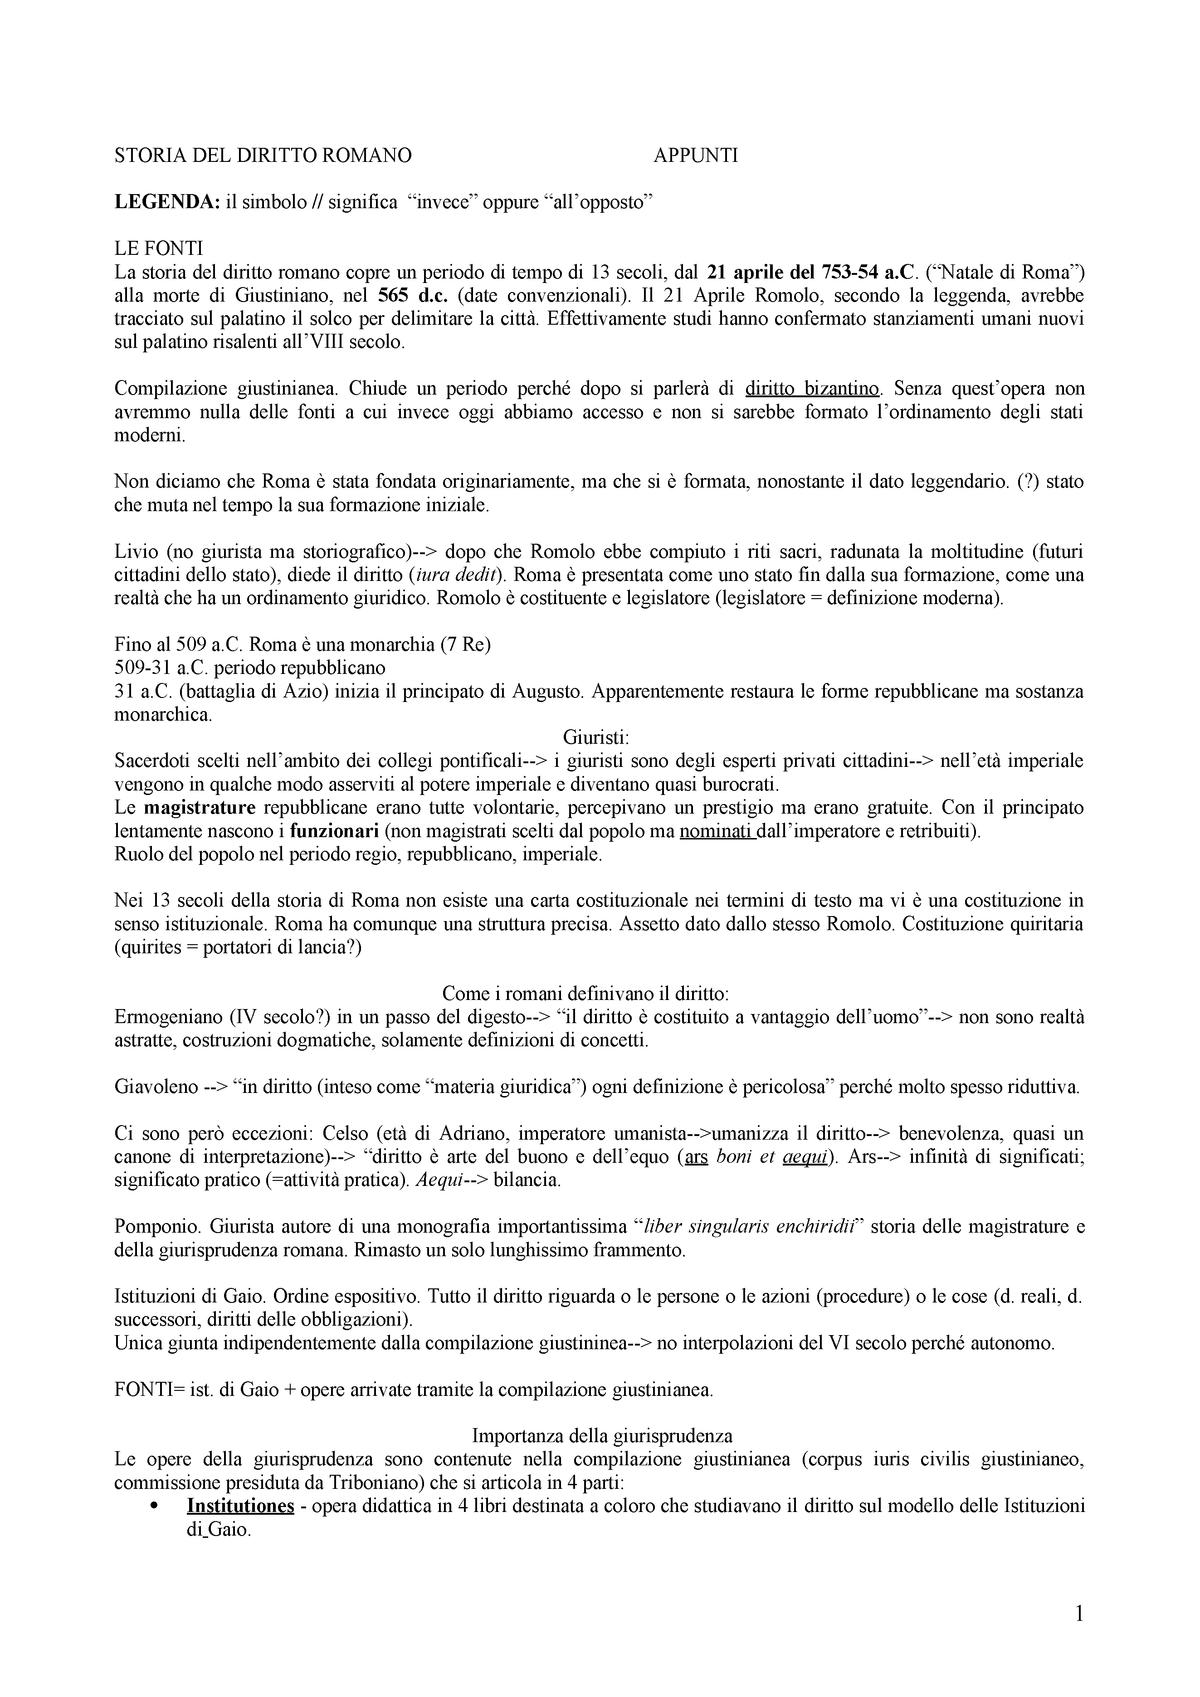 Riassunto Diritto romano 03 Dec 2018 - StuDocu